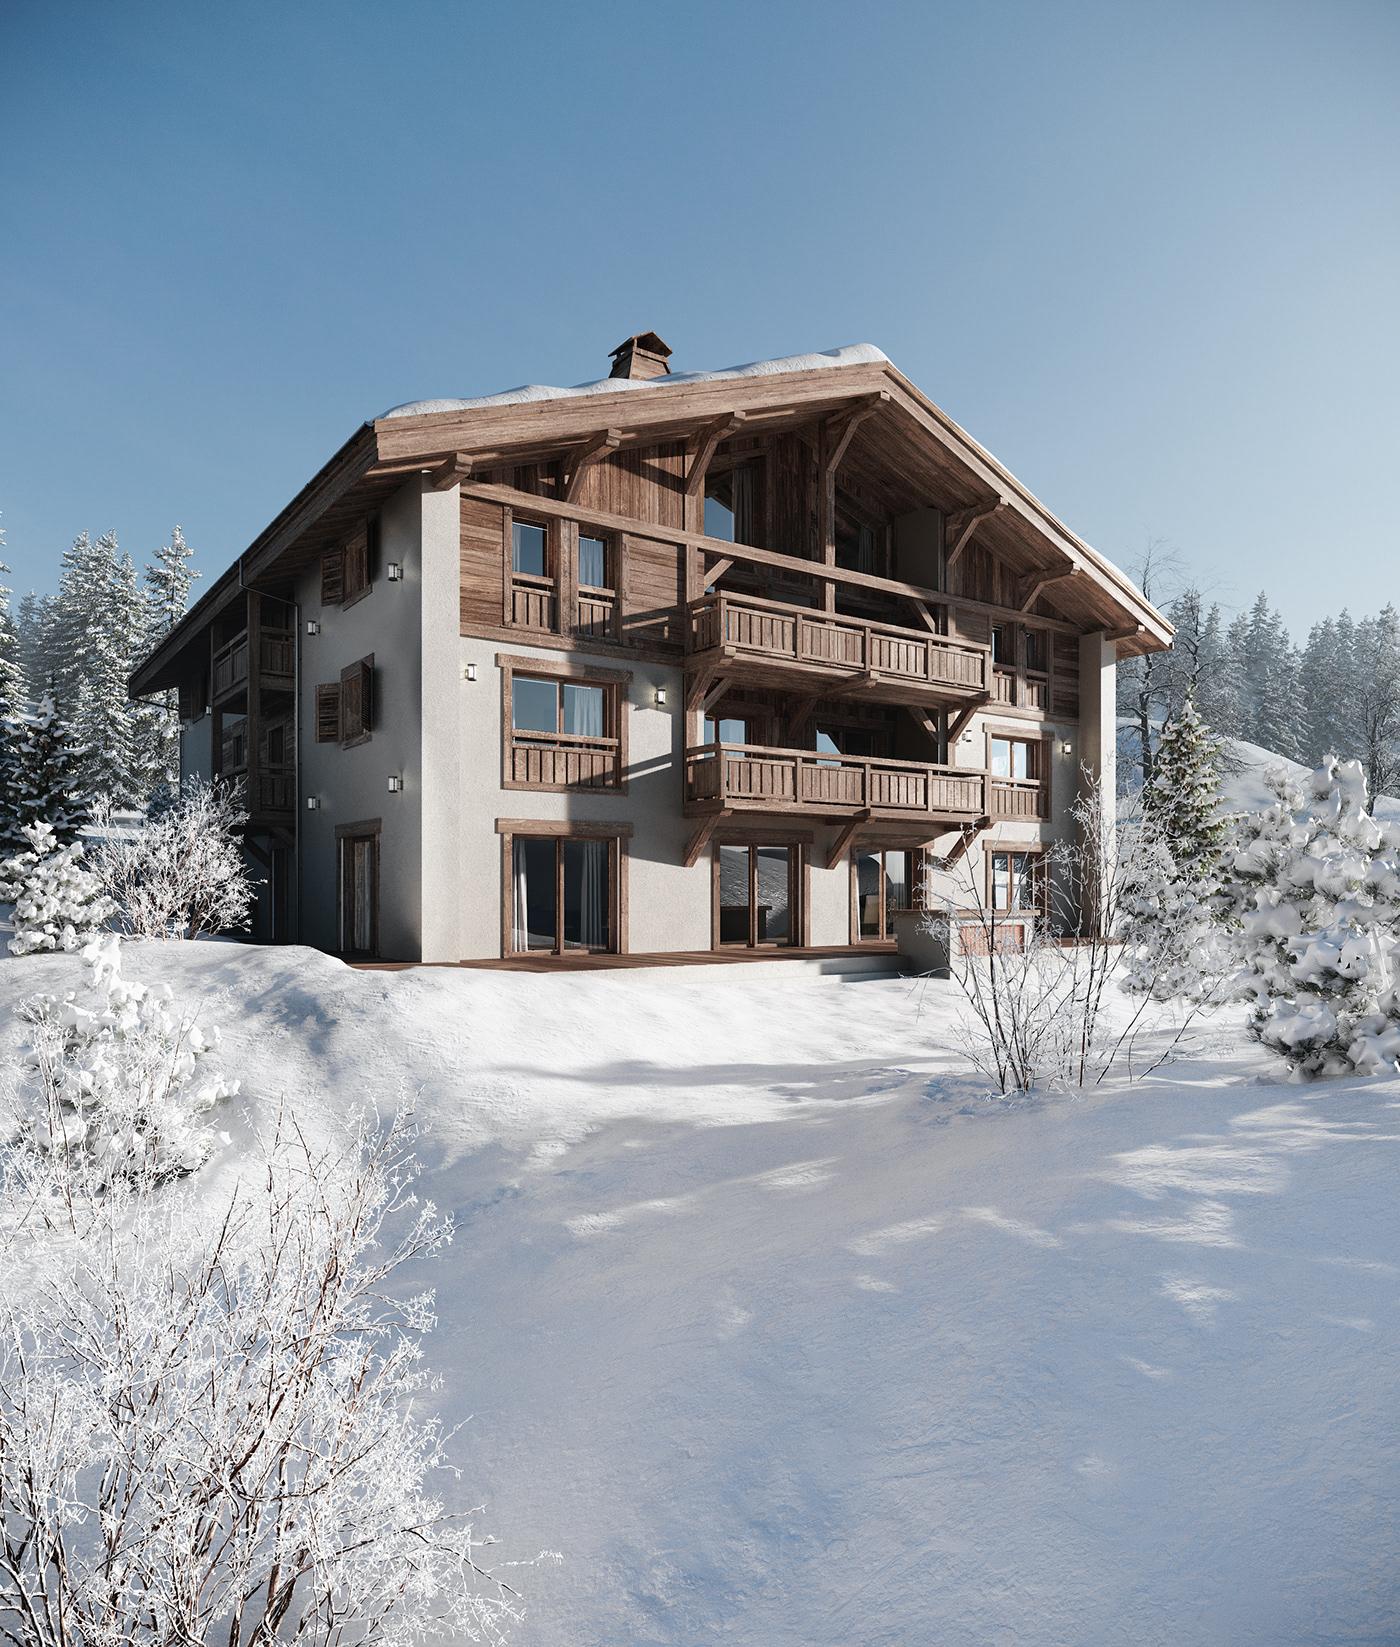 obraz27 winter snow ice Hot chalet pine viz Render